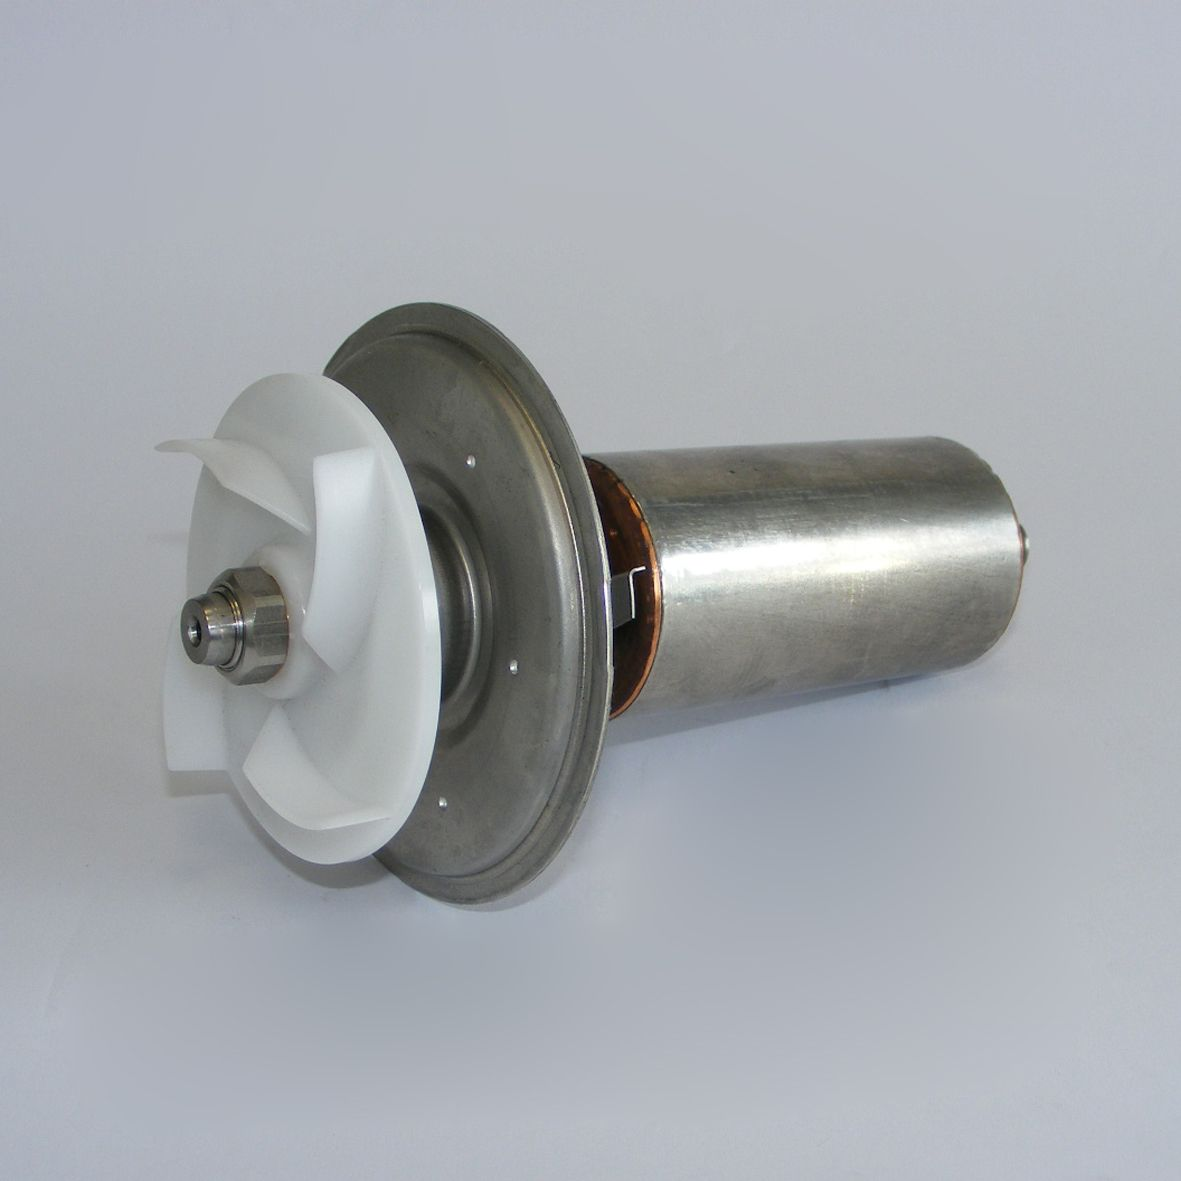 Oase rotor kpl aquamax expert 30000 teichundgarten24 for Oase teichtechnik